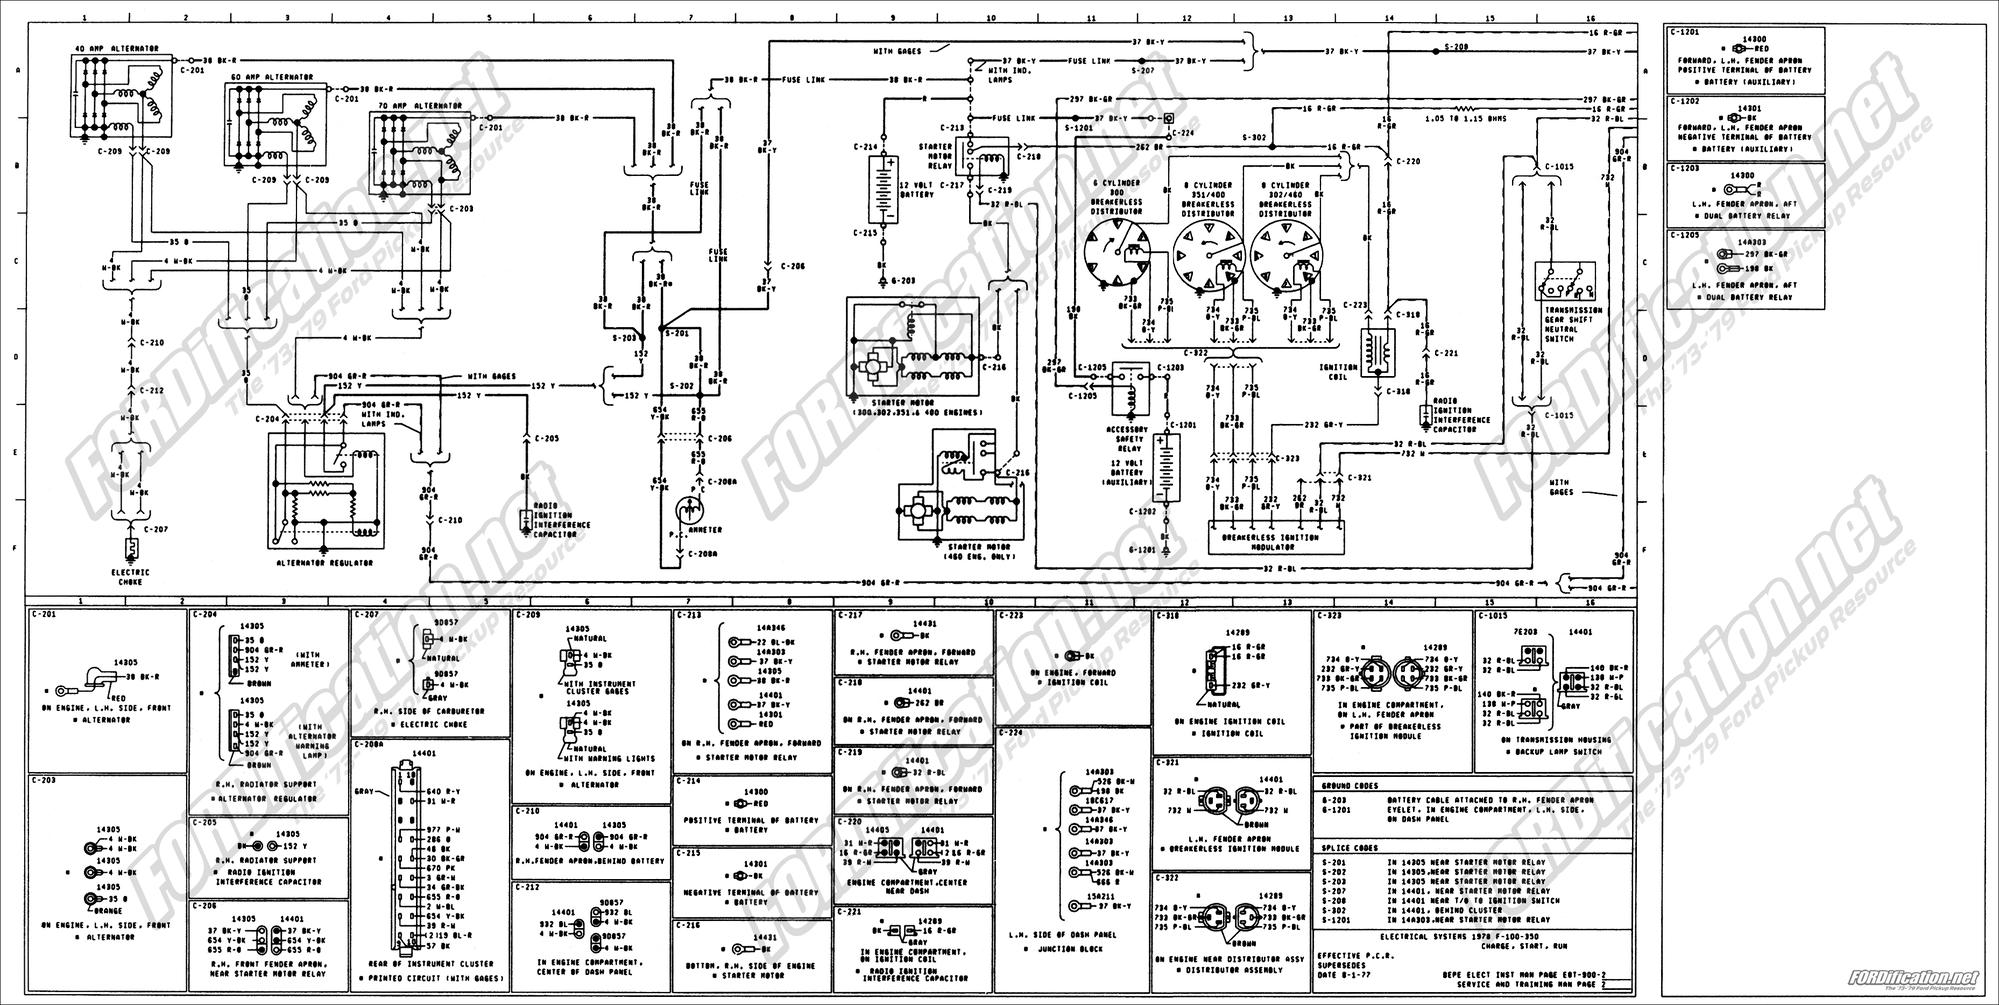 1978 f-250 not starting